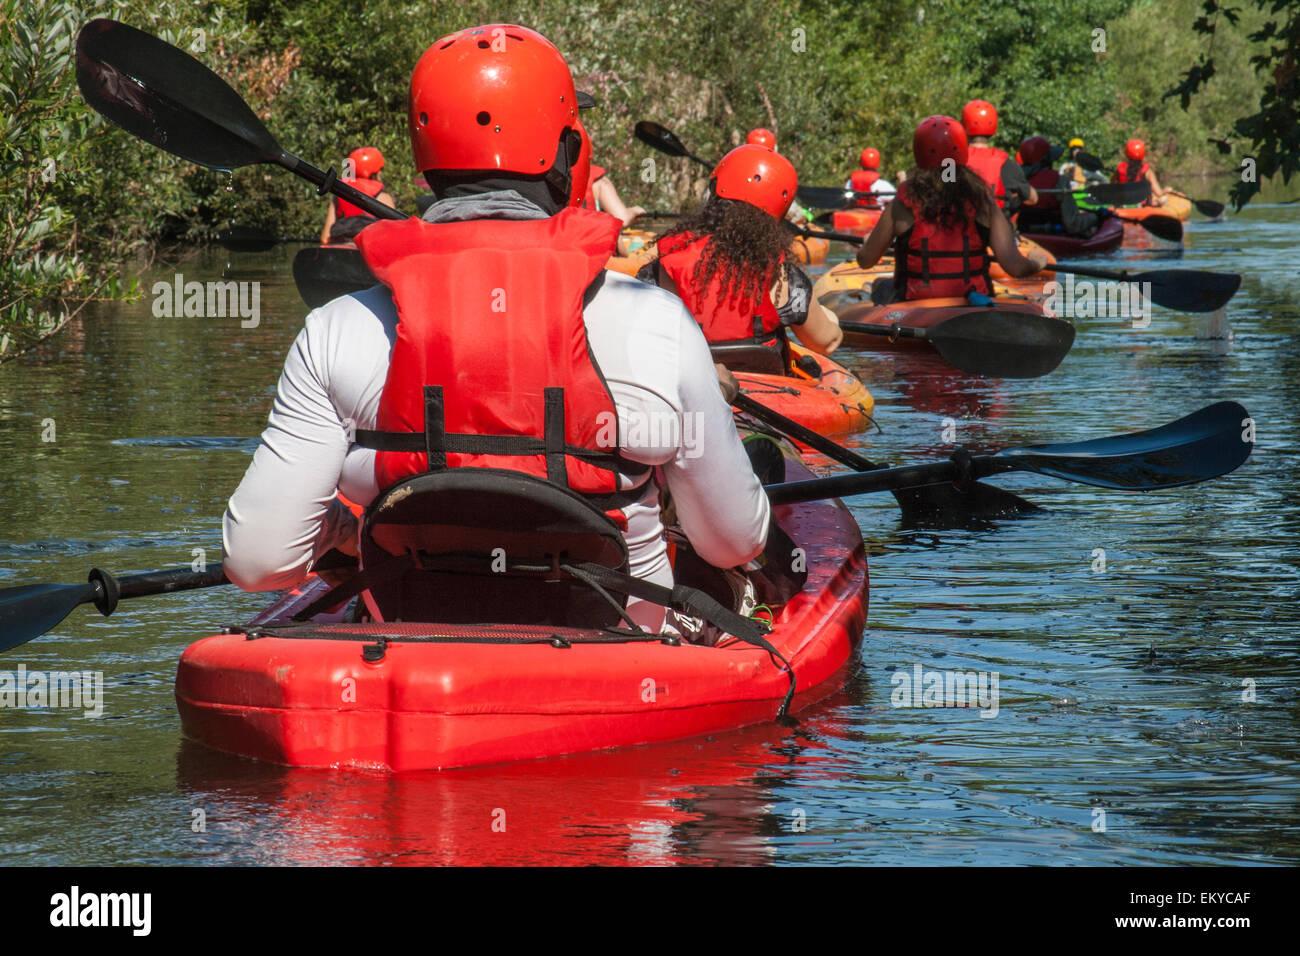 Kayaking in the Los Angeles River Recreation Zone, Sepulveda Basin, Los Angeles, California Stock Photo